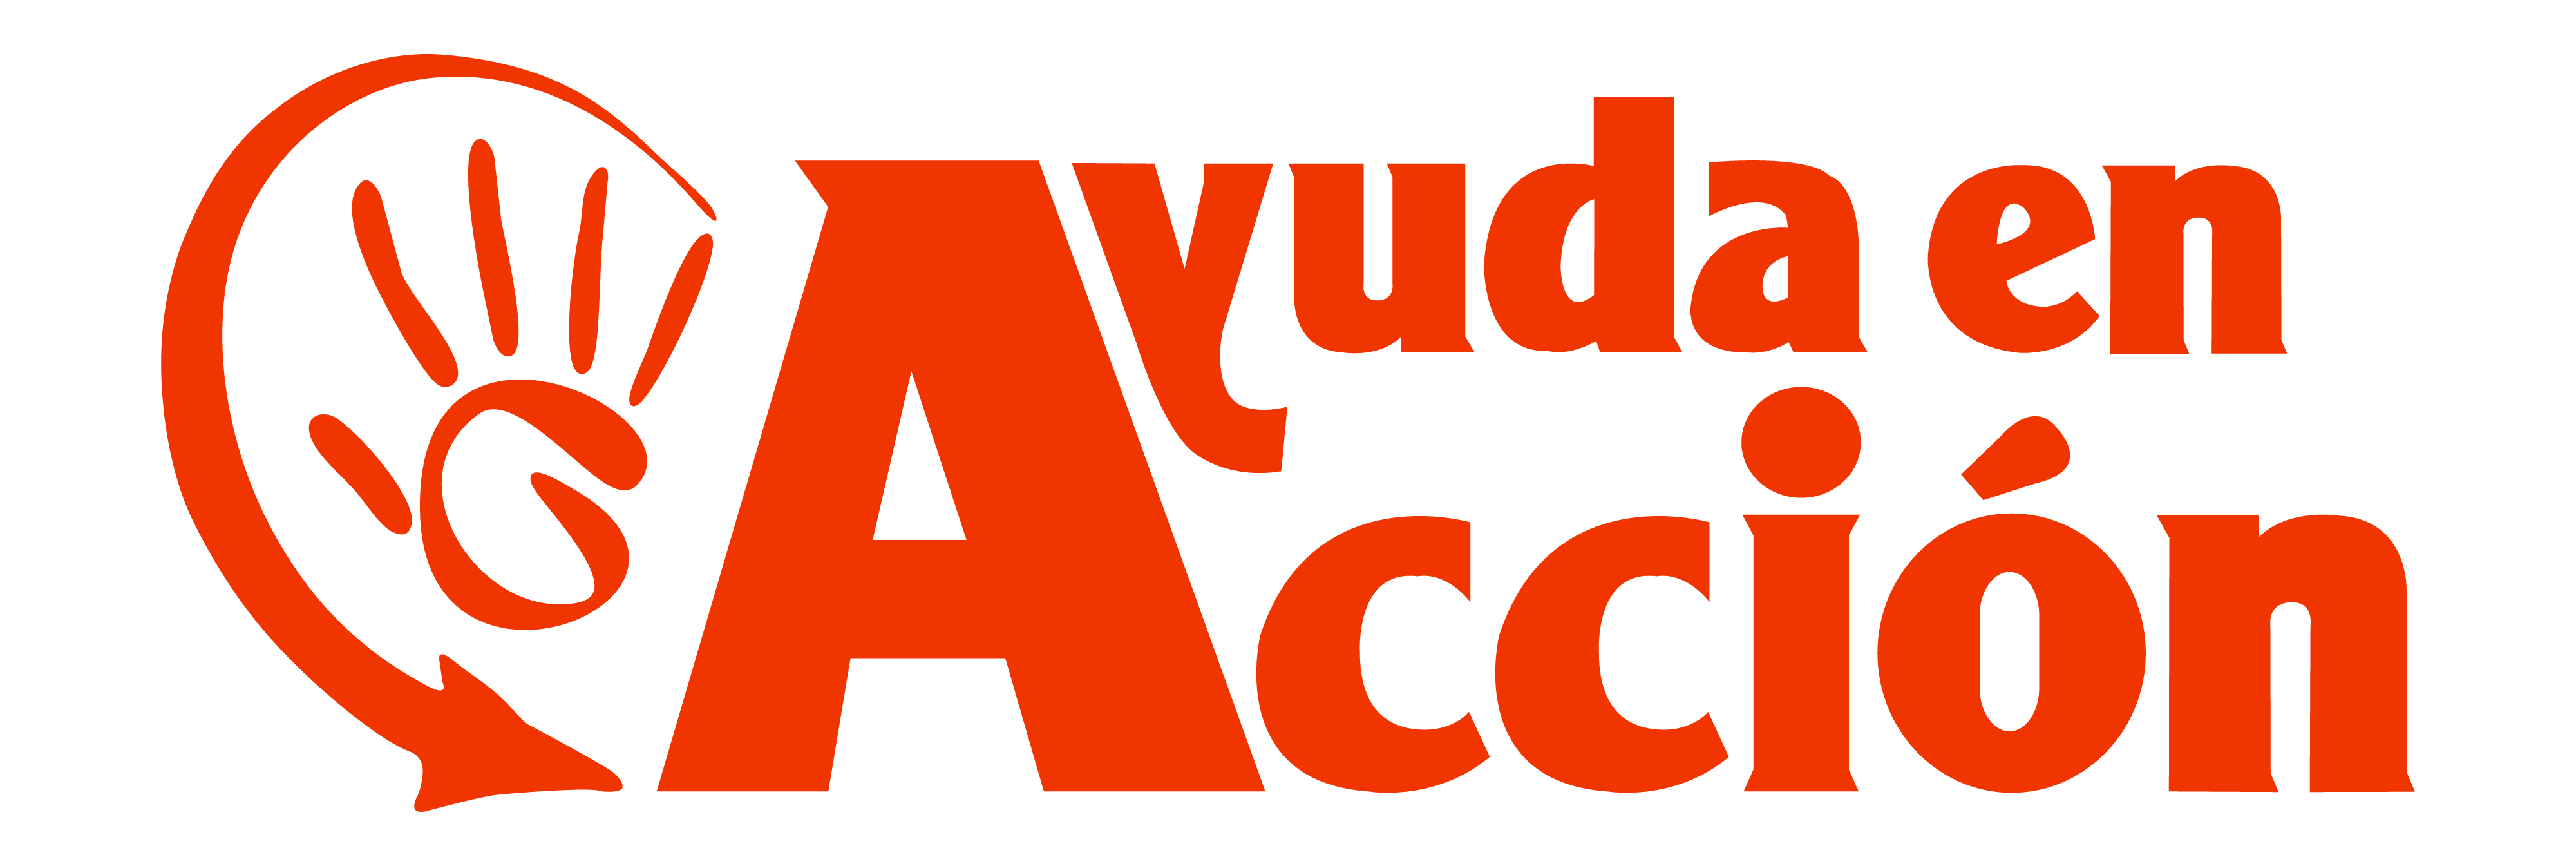 01-logotipo-ayudaEnAccion-pantalla-4000x